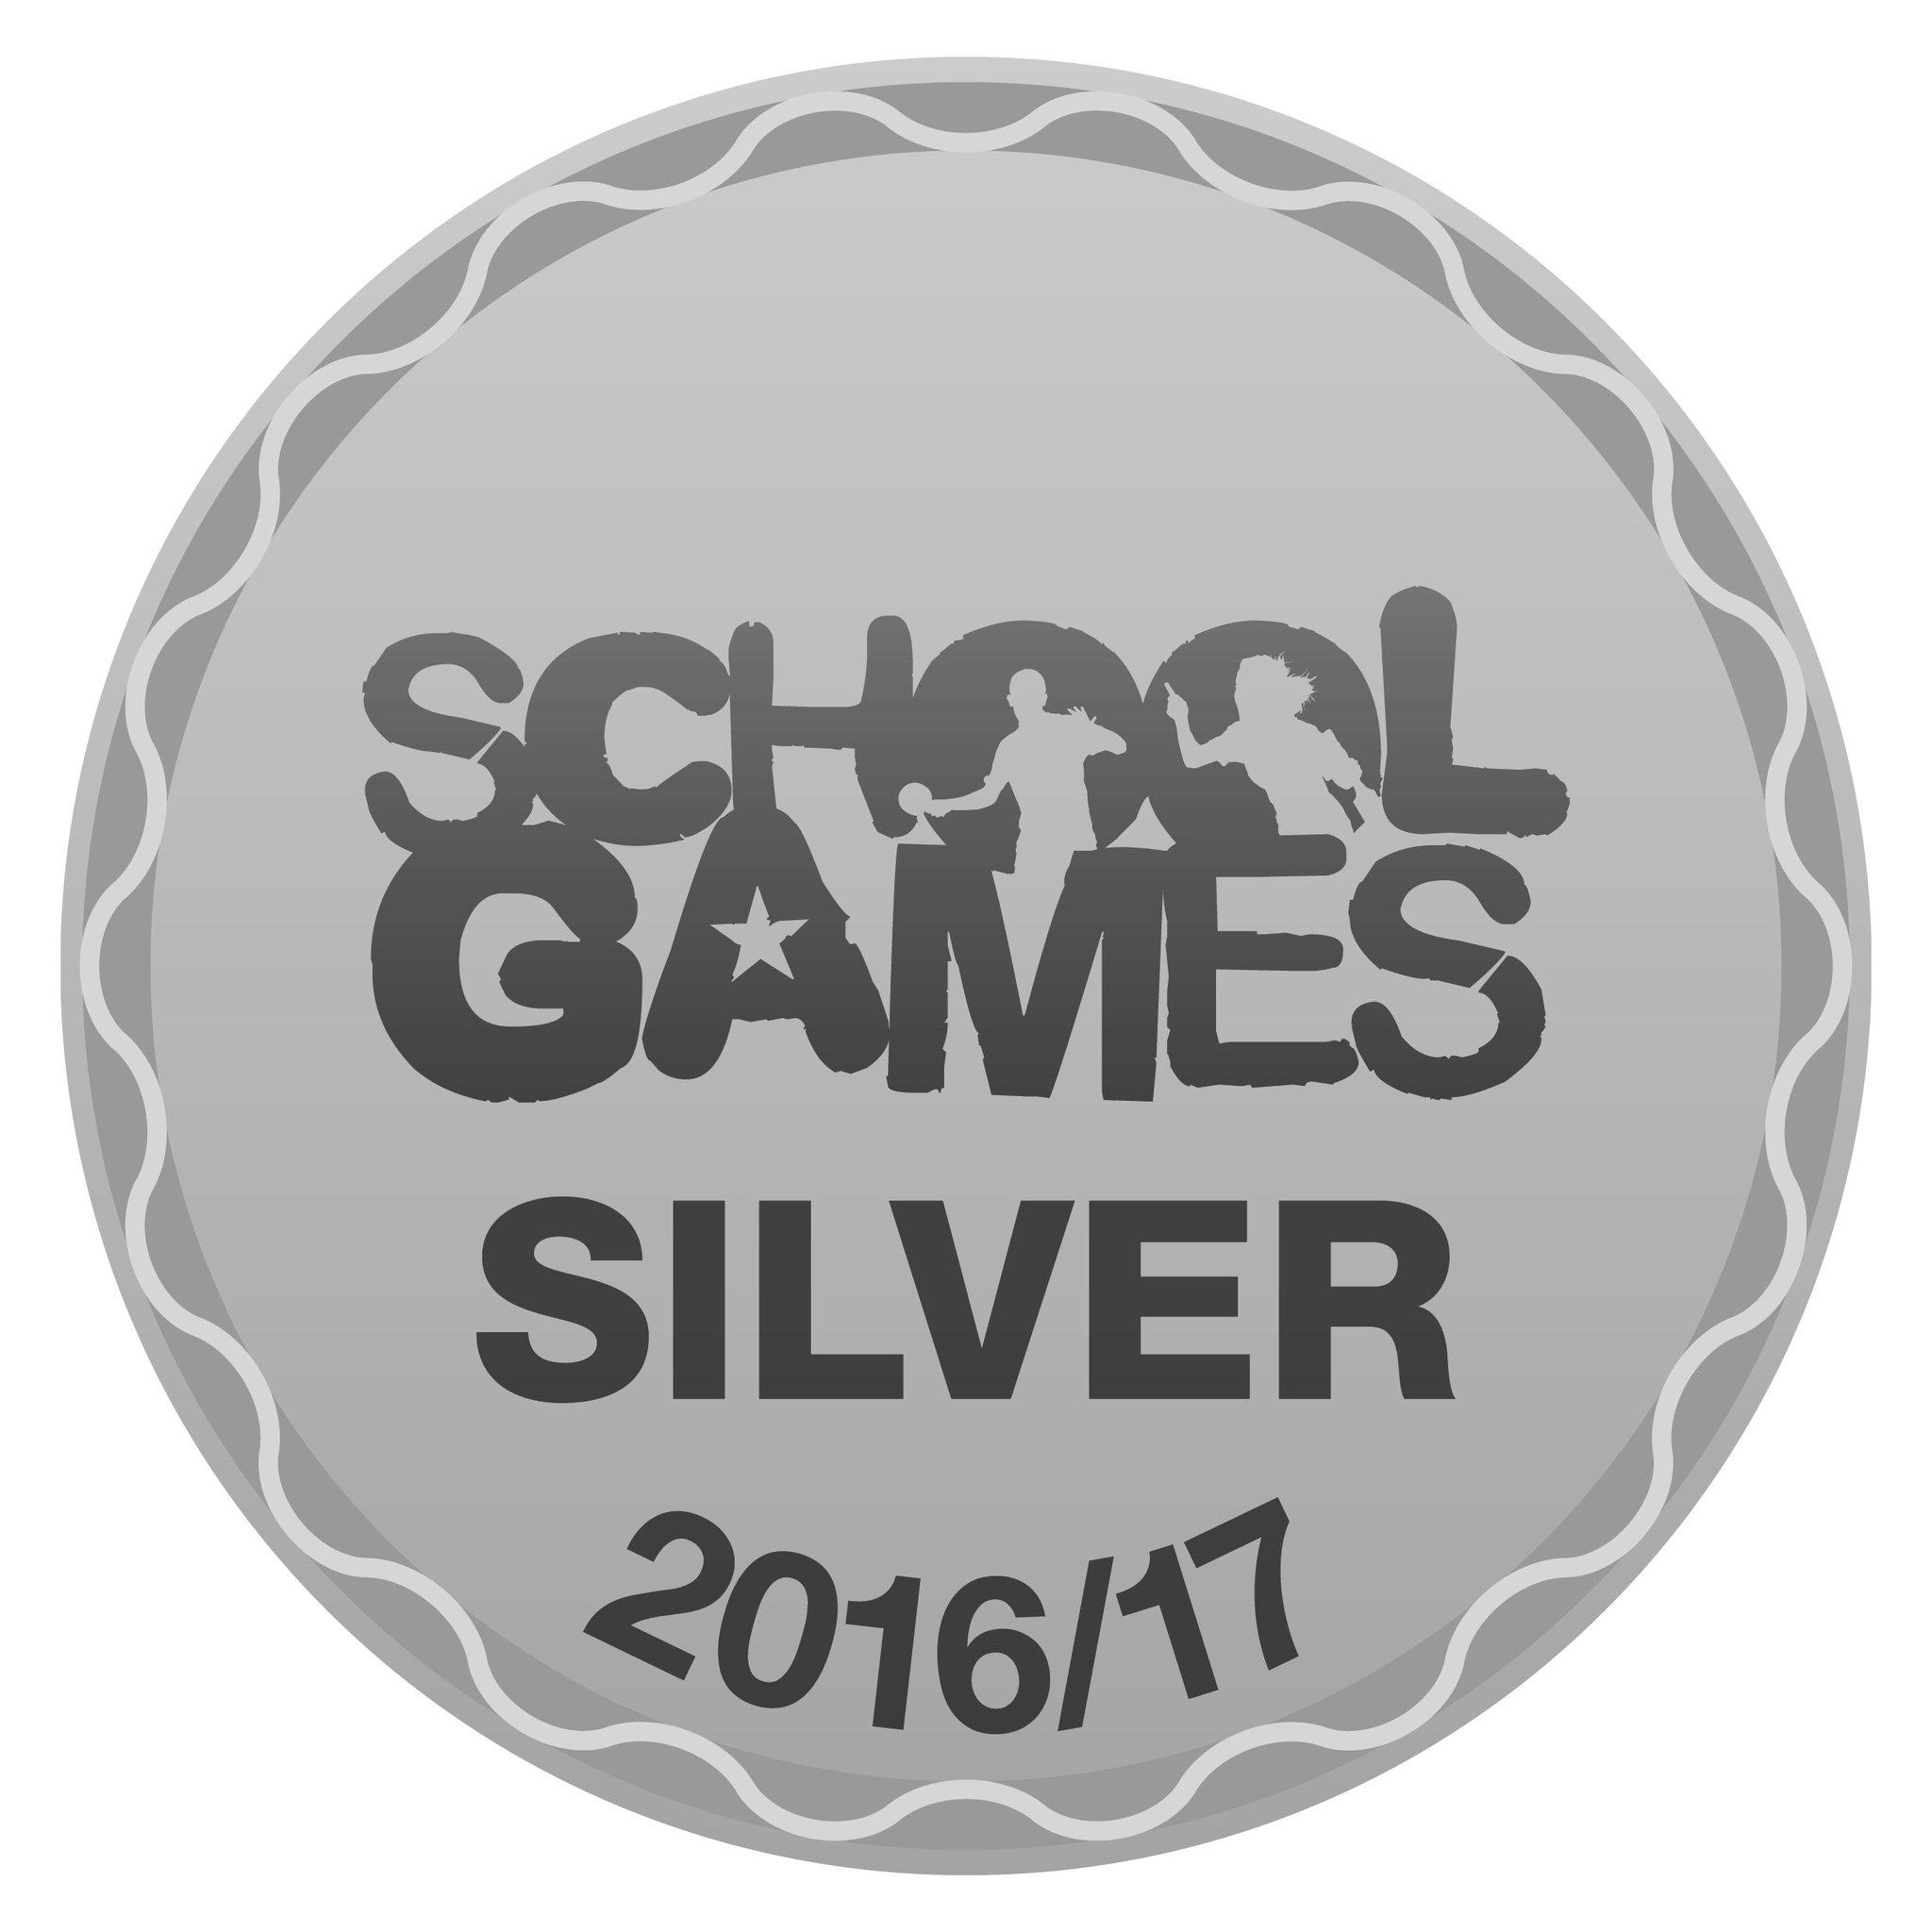 16 17 Silver Mark